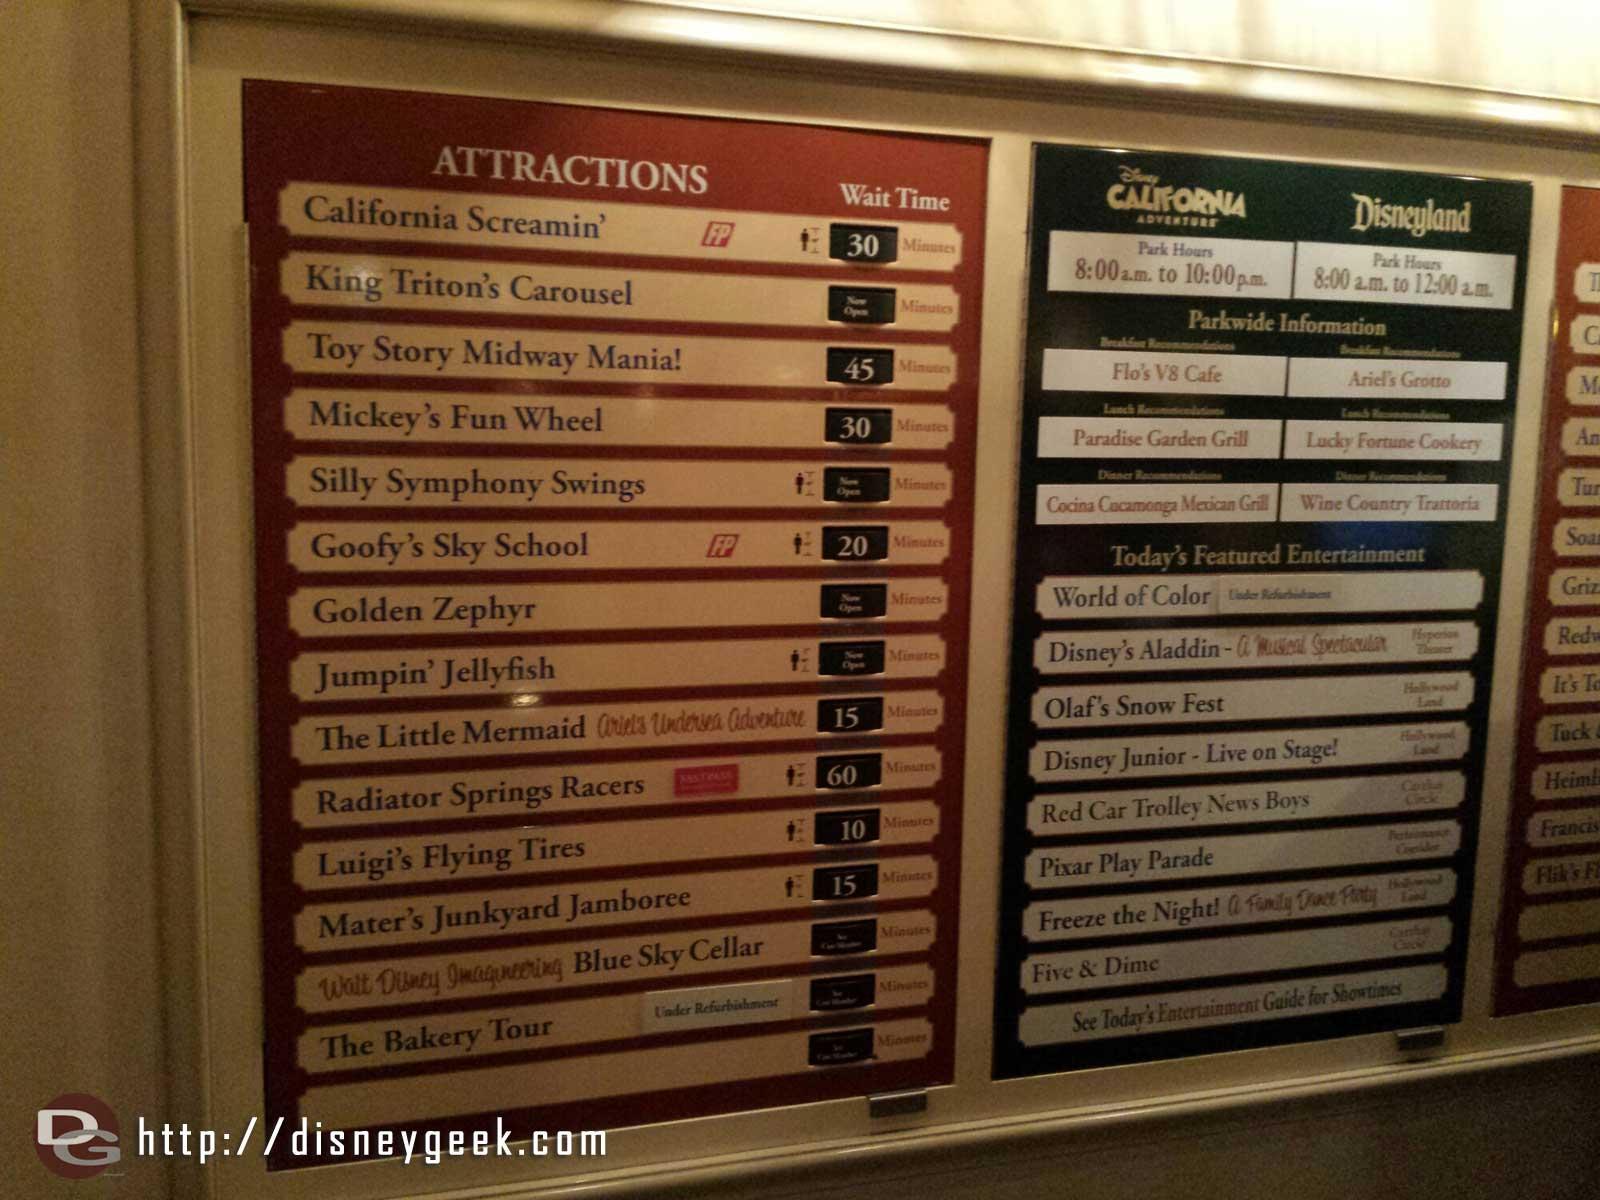 Disney California Adventure waits as of 8:13pm